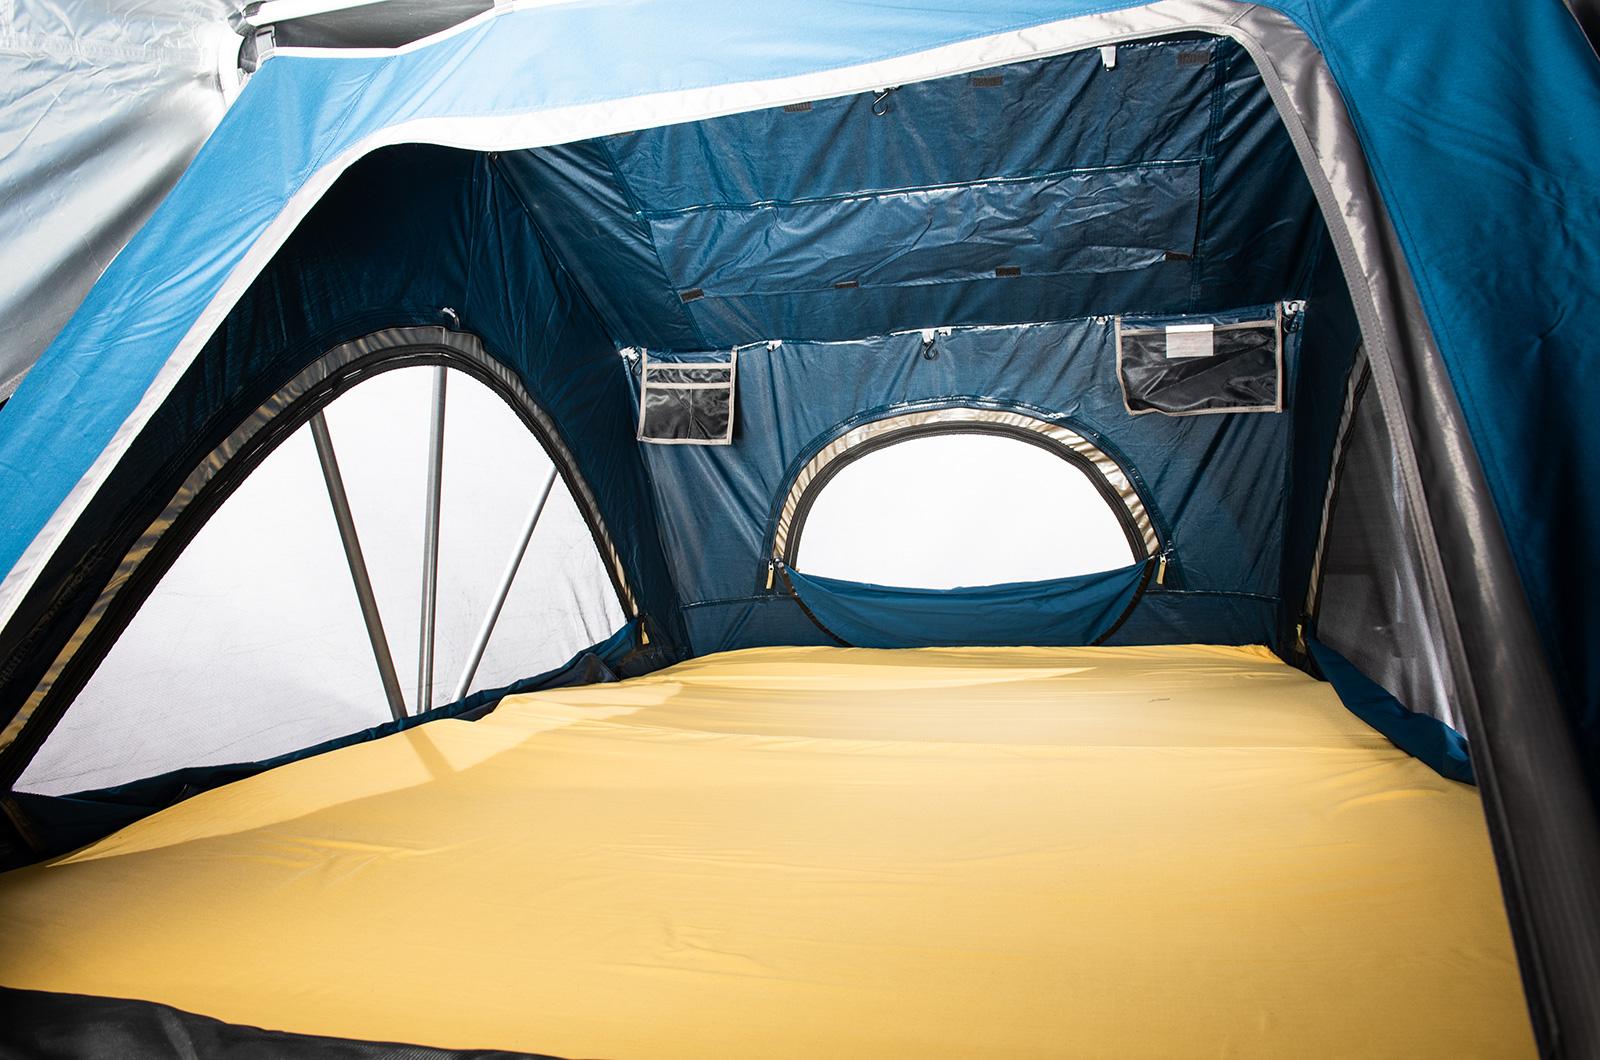 Sheepie Yuna blue large mattress